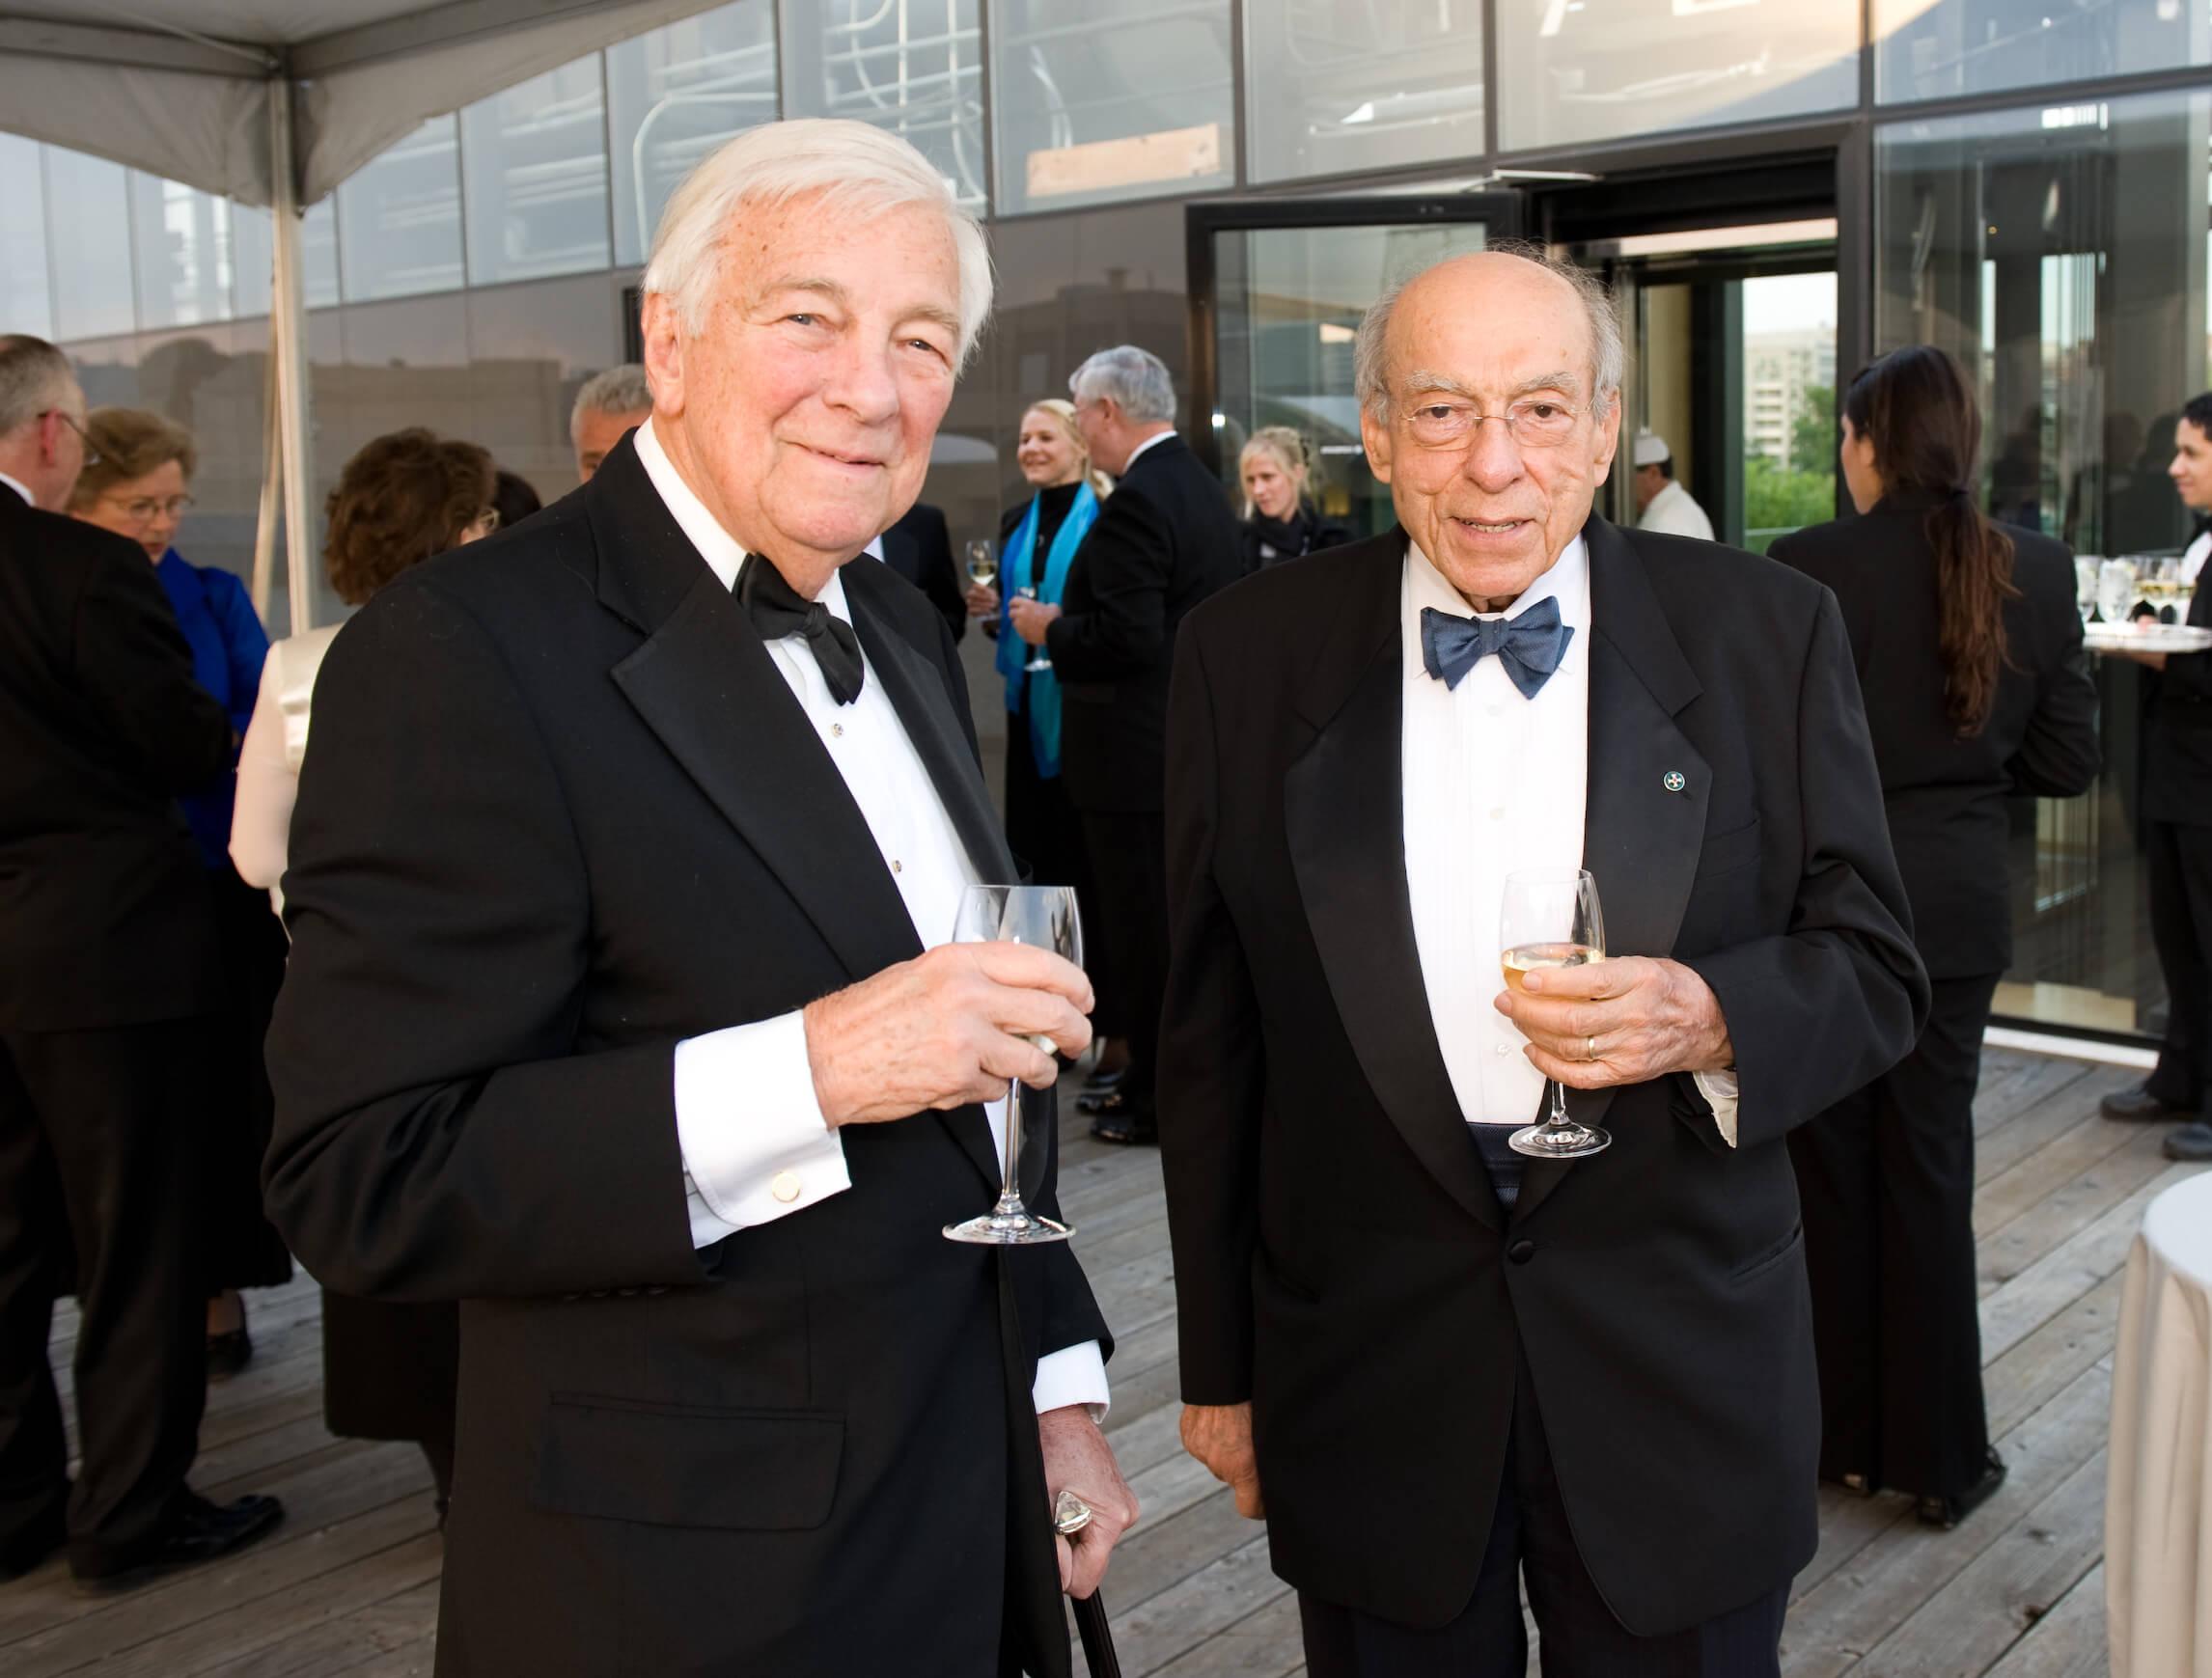 Mr. John C. Whitehead and Mr. August J. Molnar